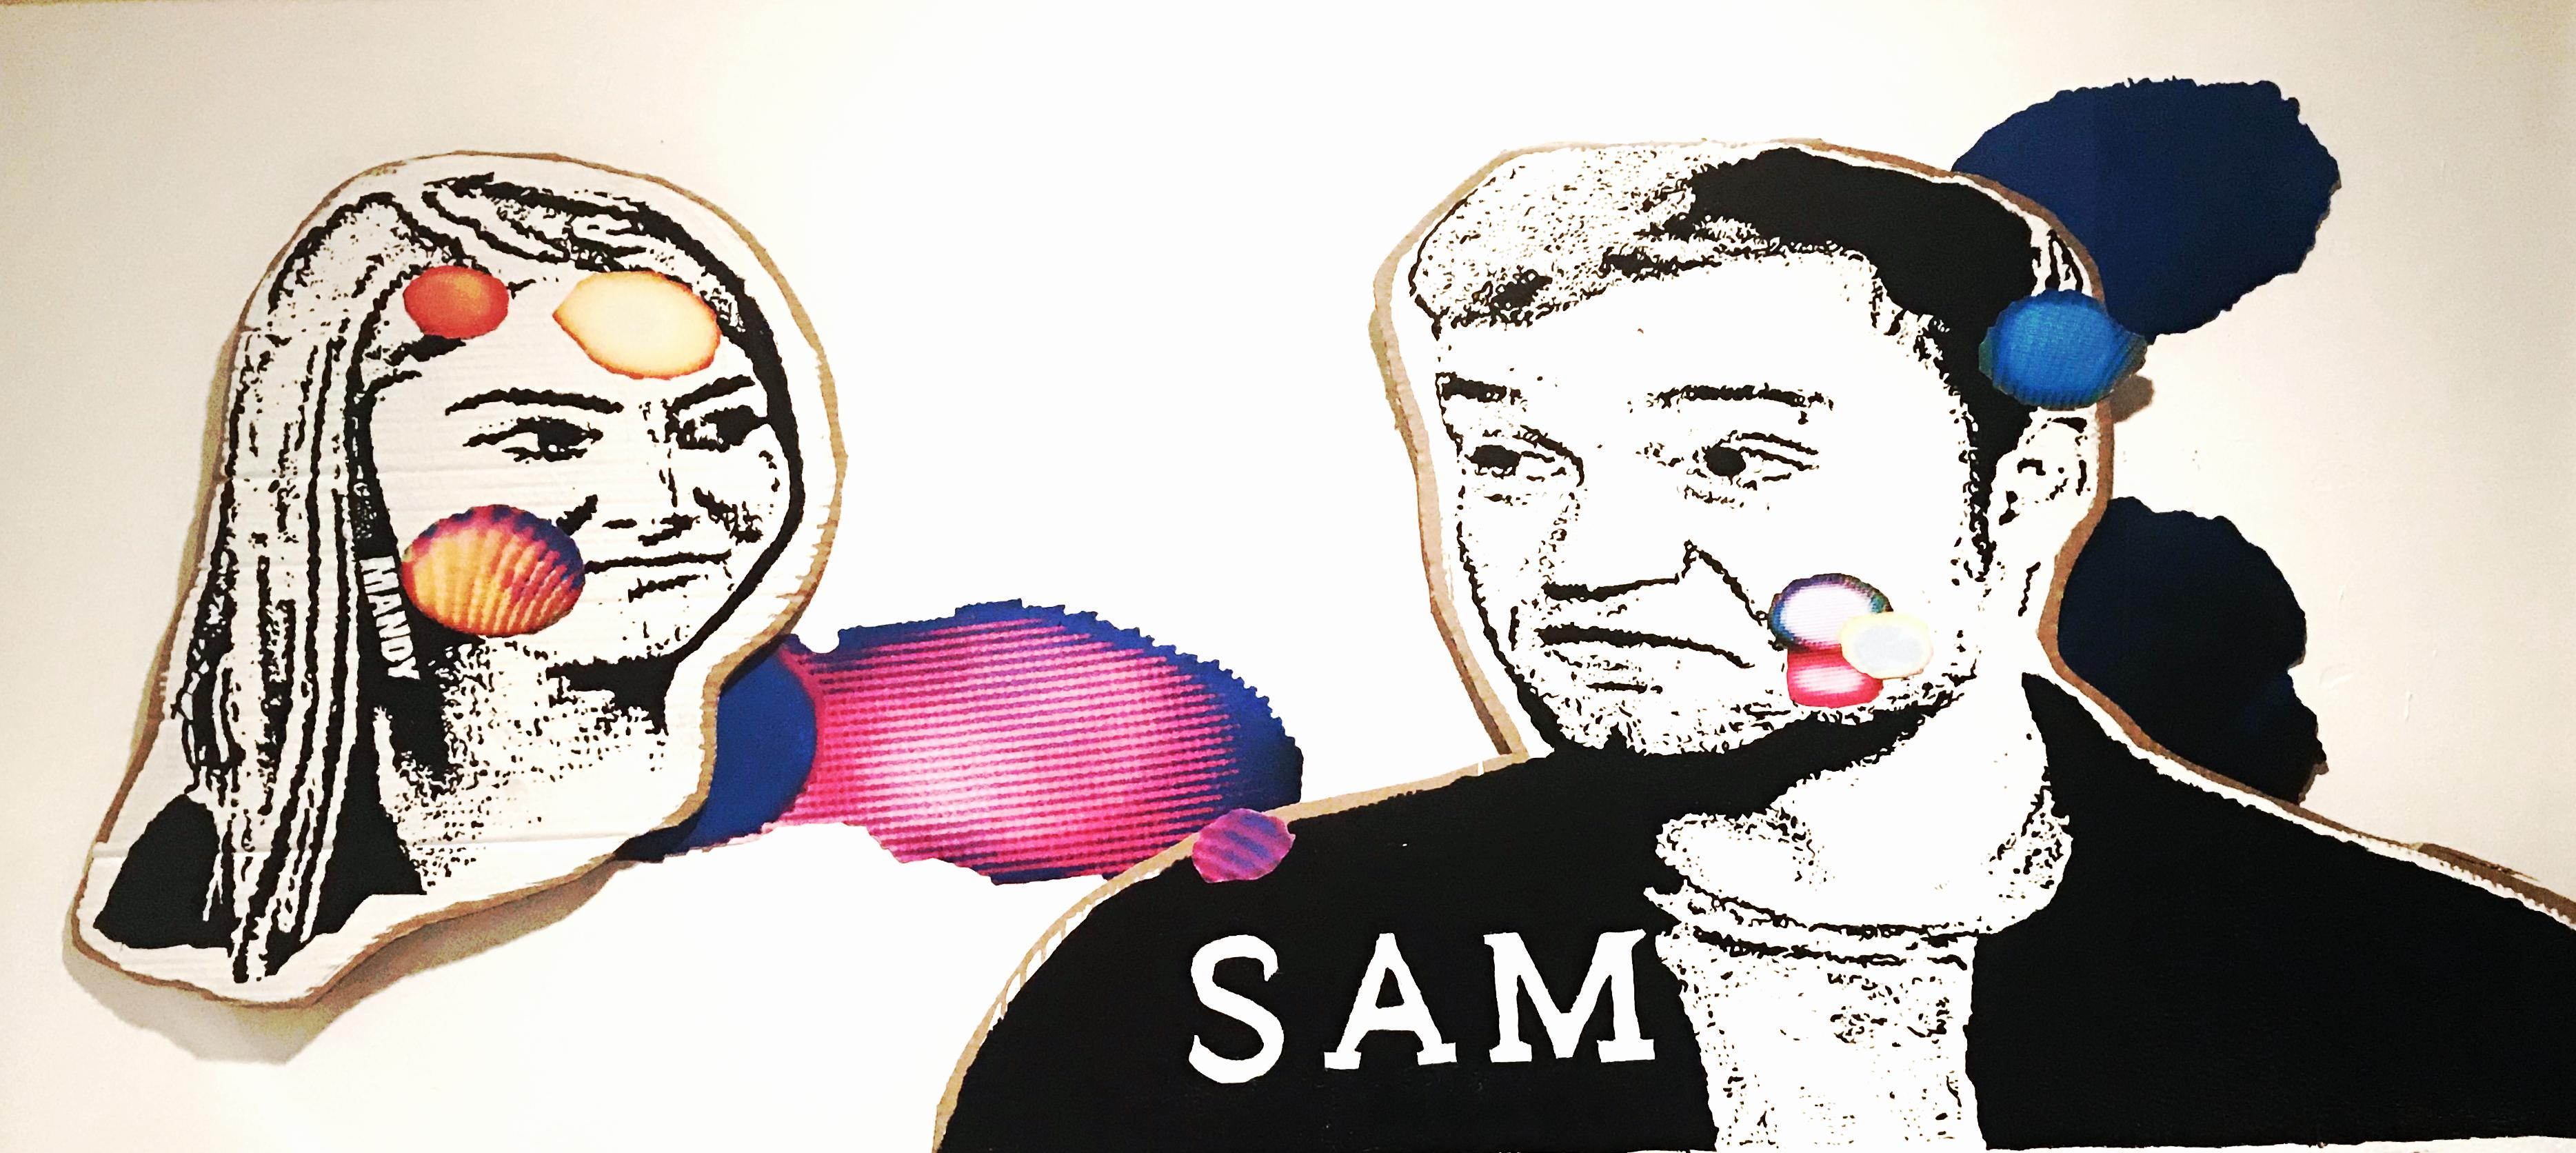 Mandy and Sam